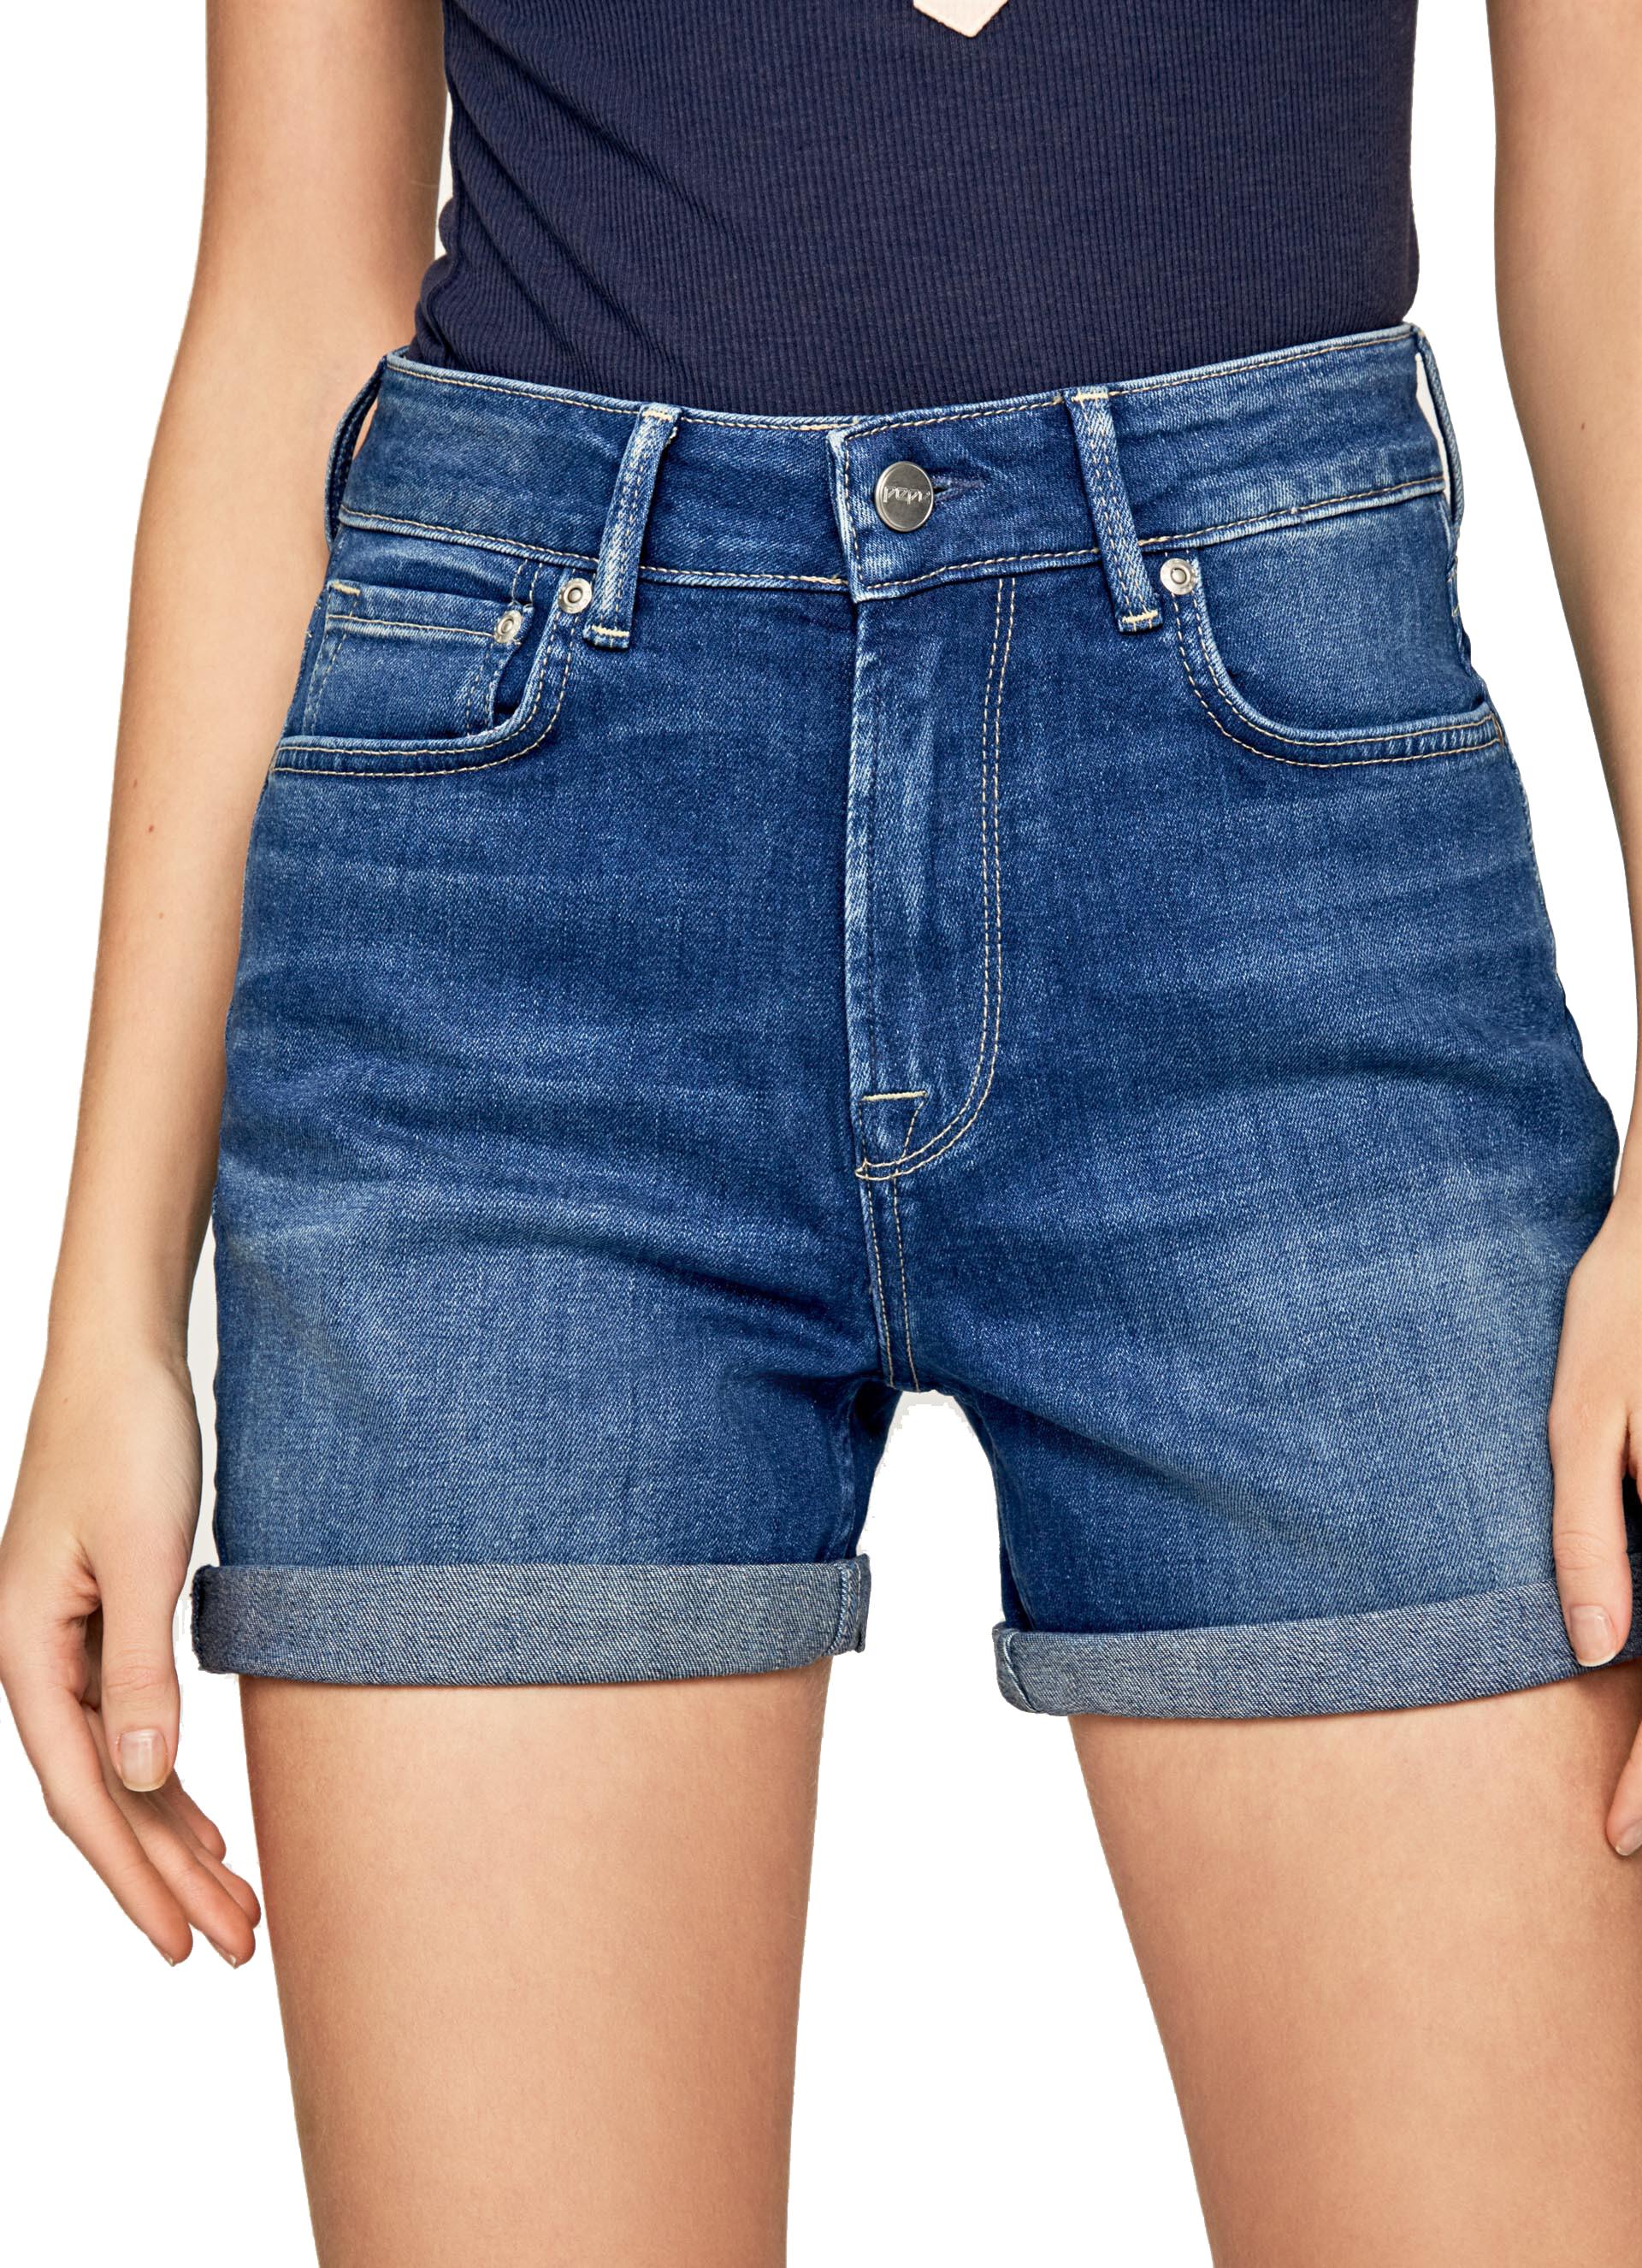 Pantalon Corto Mujer Pepe Jeans Mary Short Korner